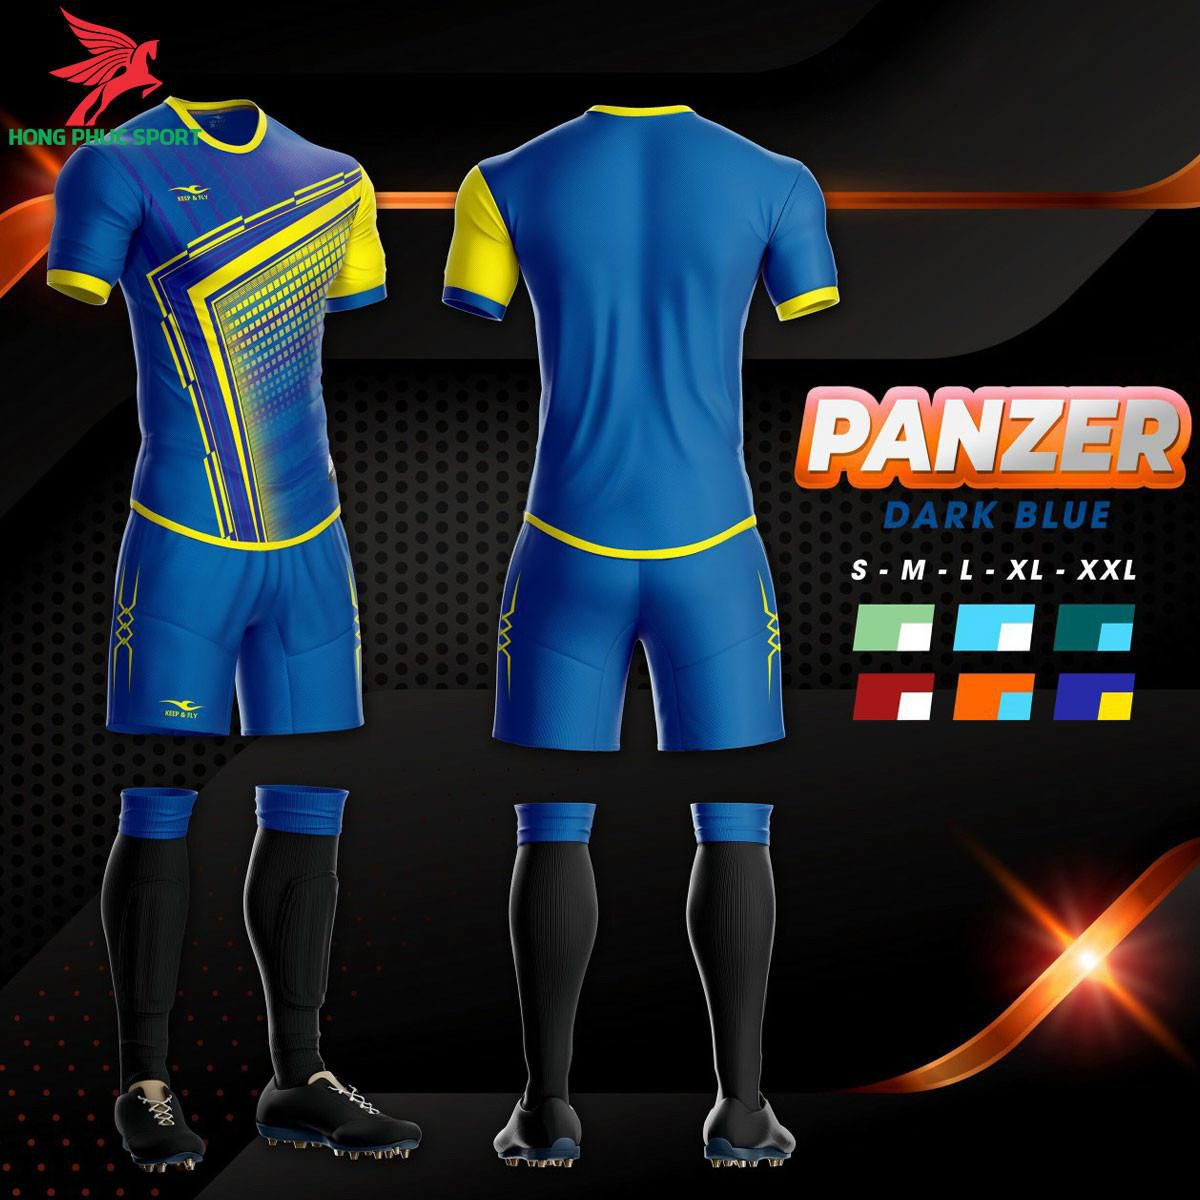 https://cdn.hongphucsport.com/unsafe/s4.shopbay.vn/files/285/ao-khong-logo-keep-fly-panzer-2021-mau-xanh-duong-603ef90620d9c.jpg